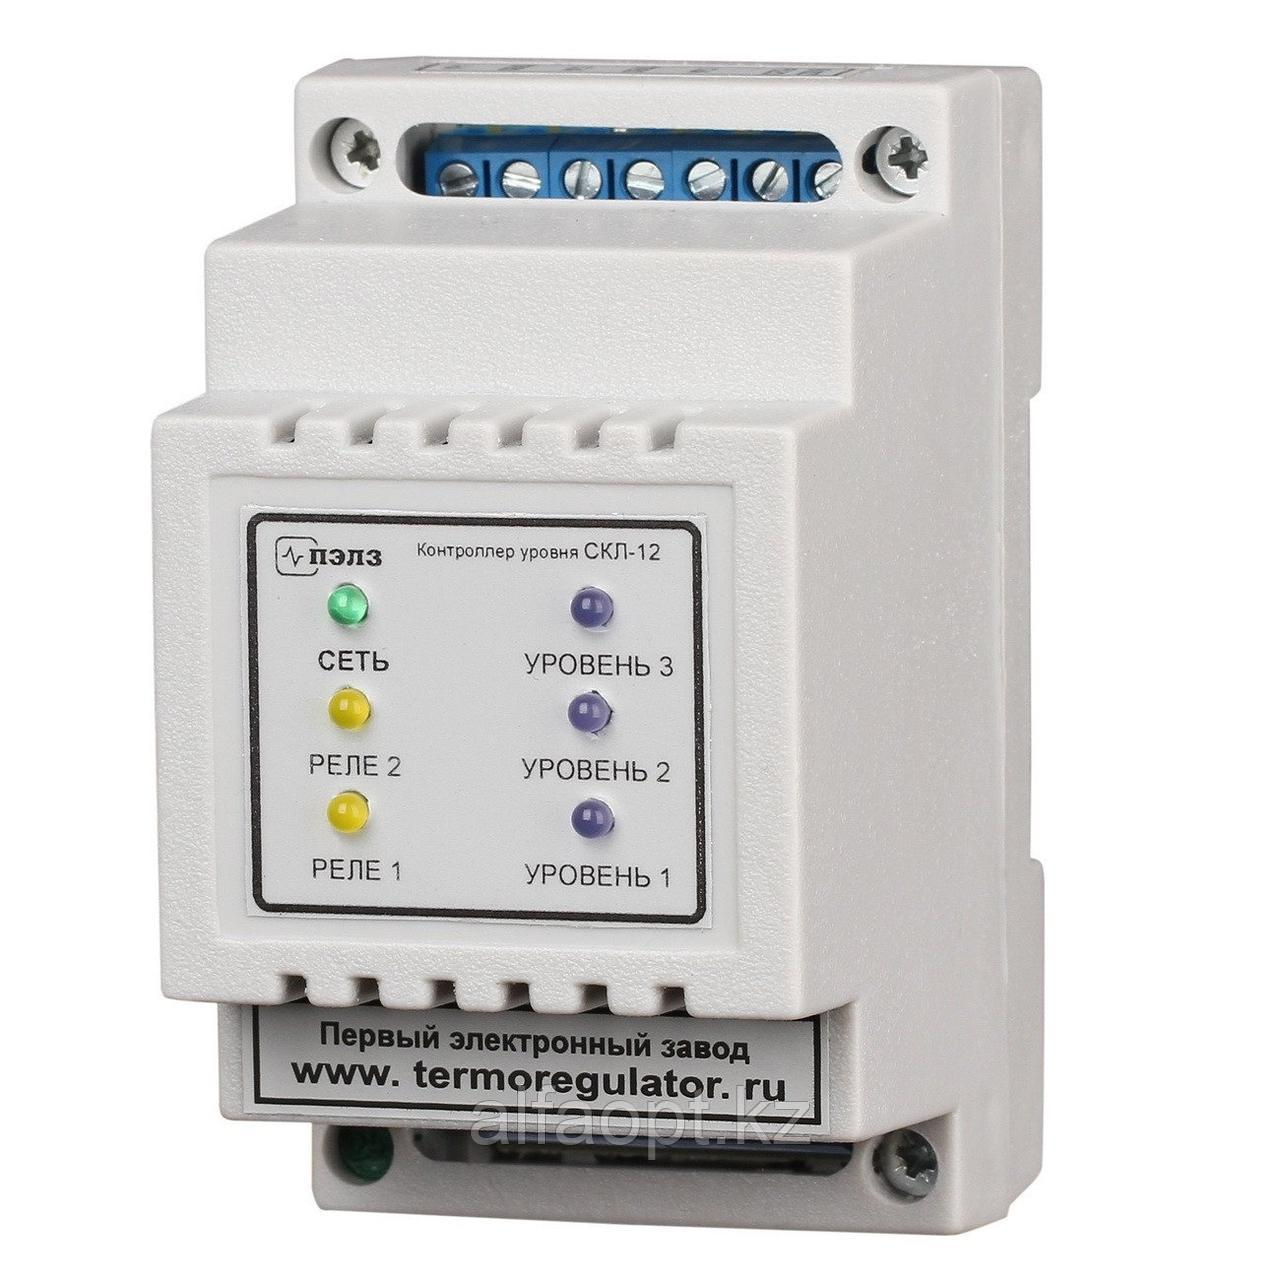 Модуль контроллера уровня СКЛ-12 (без датчиков)